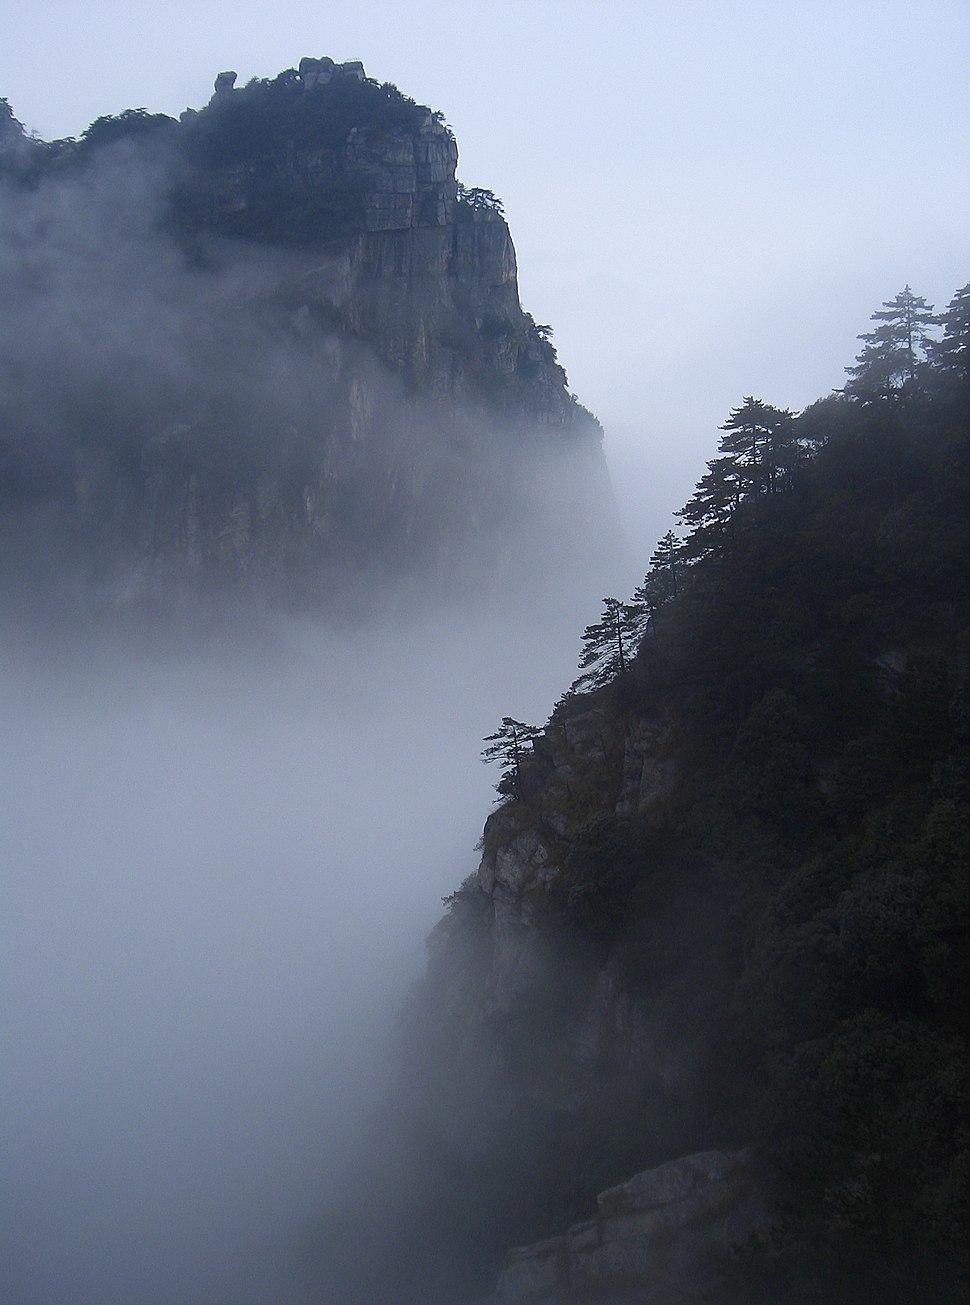 Mount Lushan - fog